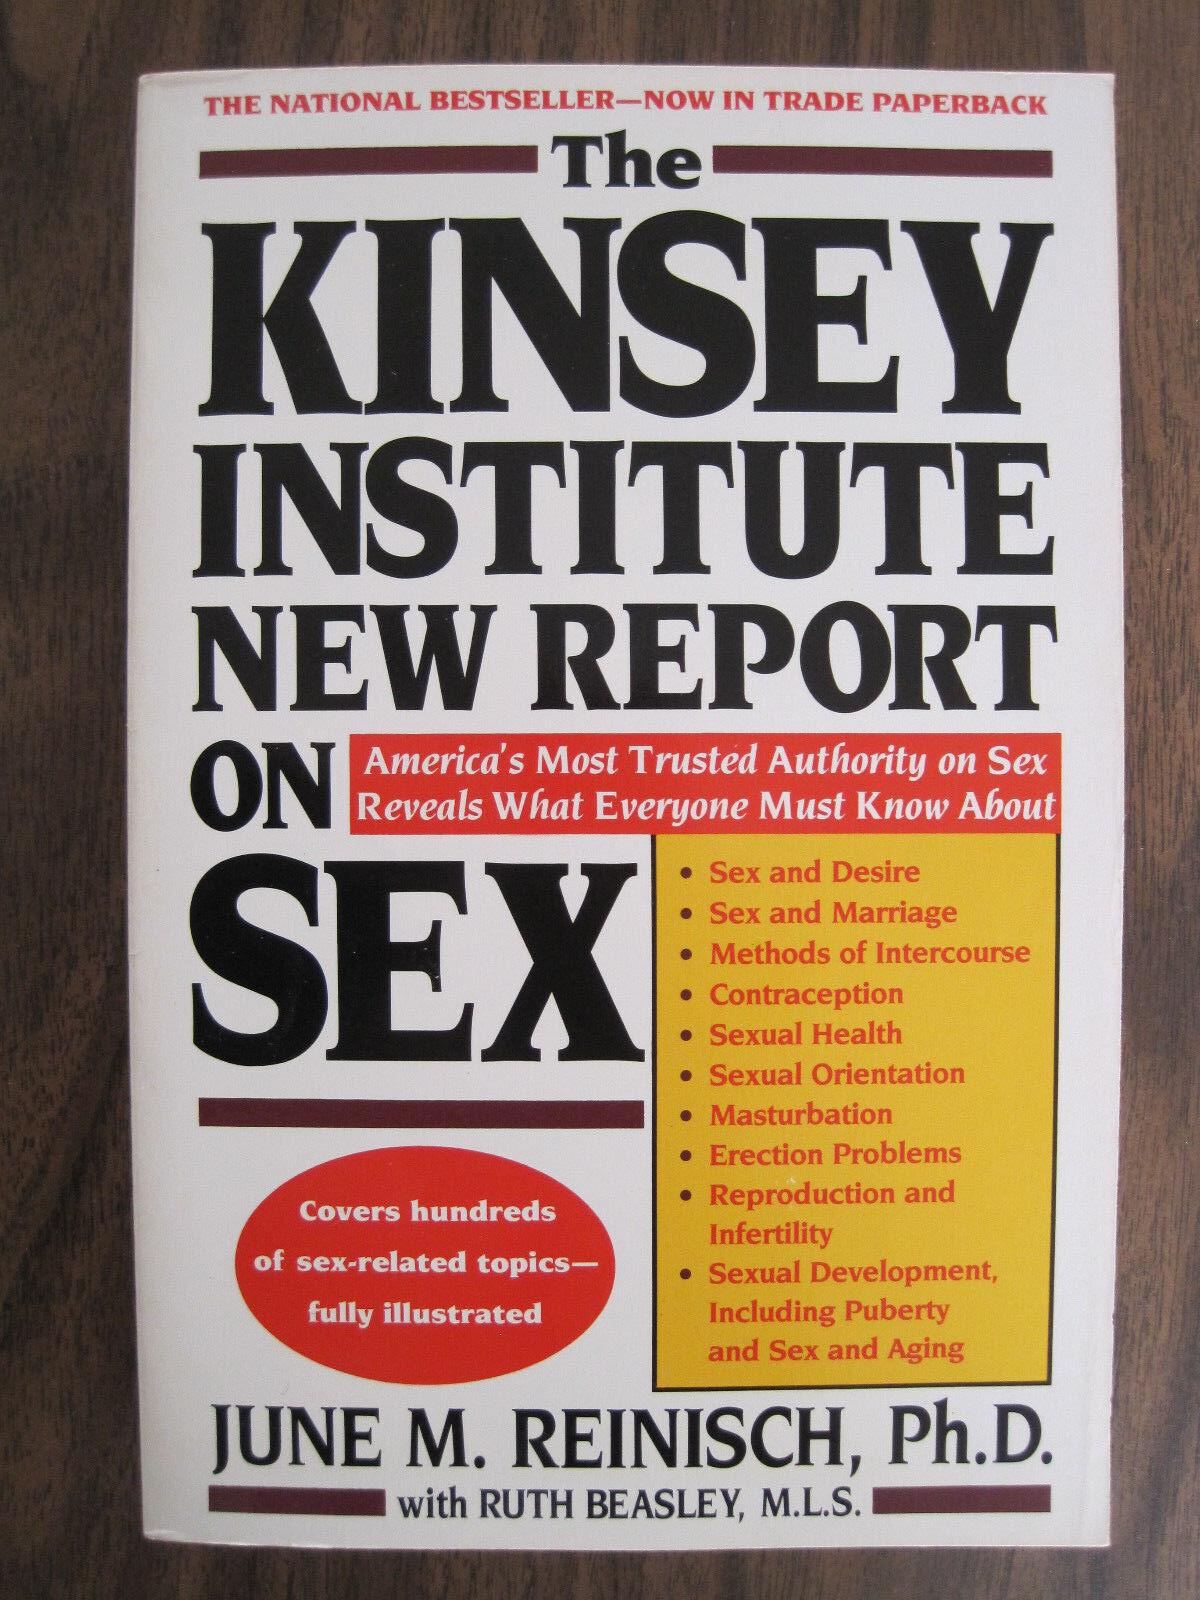 Institute kinsey new report sex